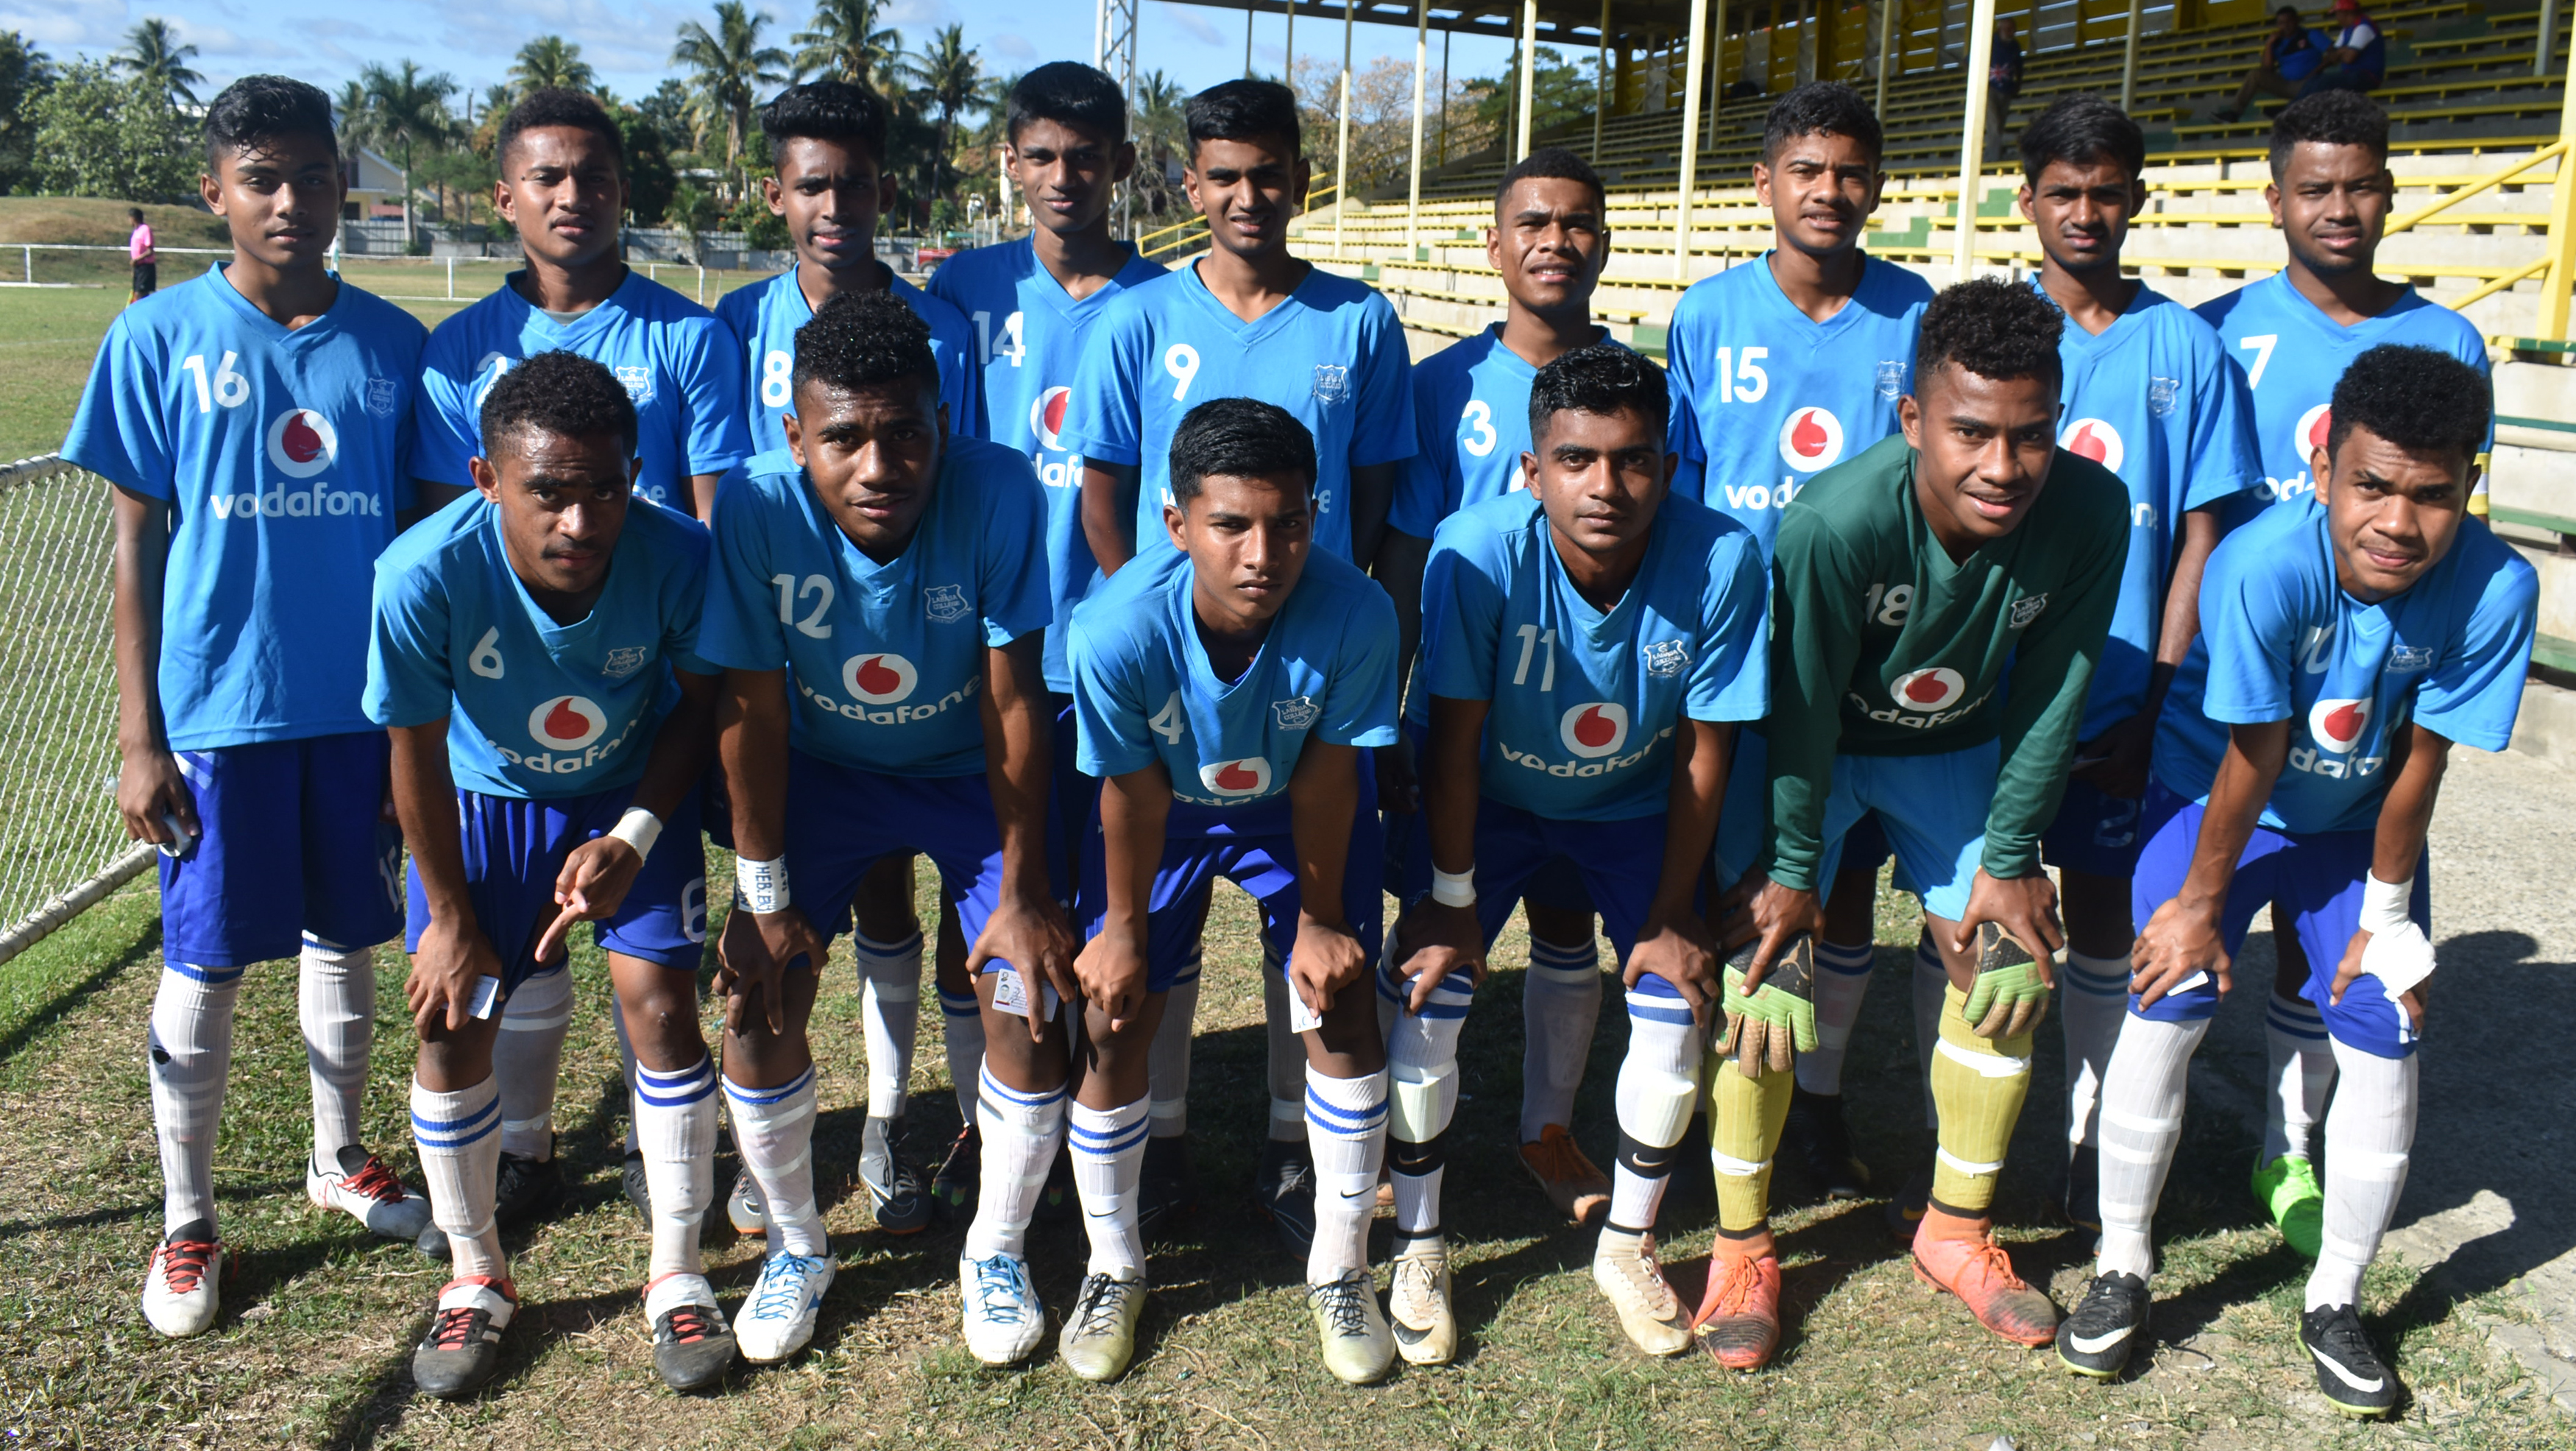 Labasa College Under 19 football team at the Prince Charles Park in Nadi. Photo: WAISEA NASOKIA